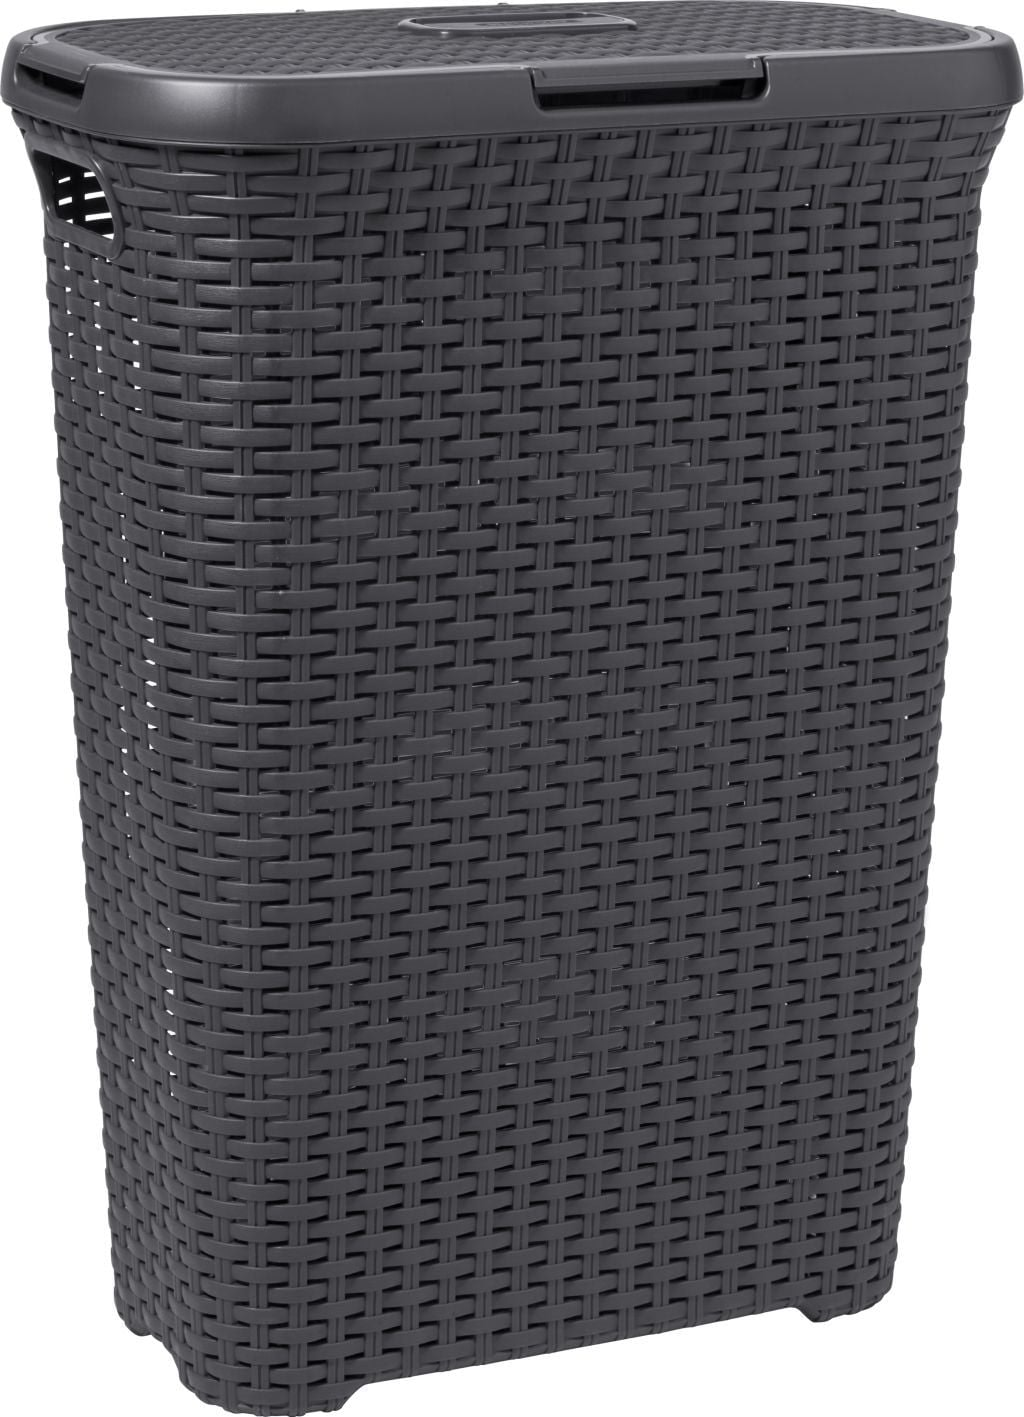 Curver Style wasbox 40 liter grijs Stuk